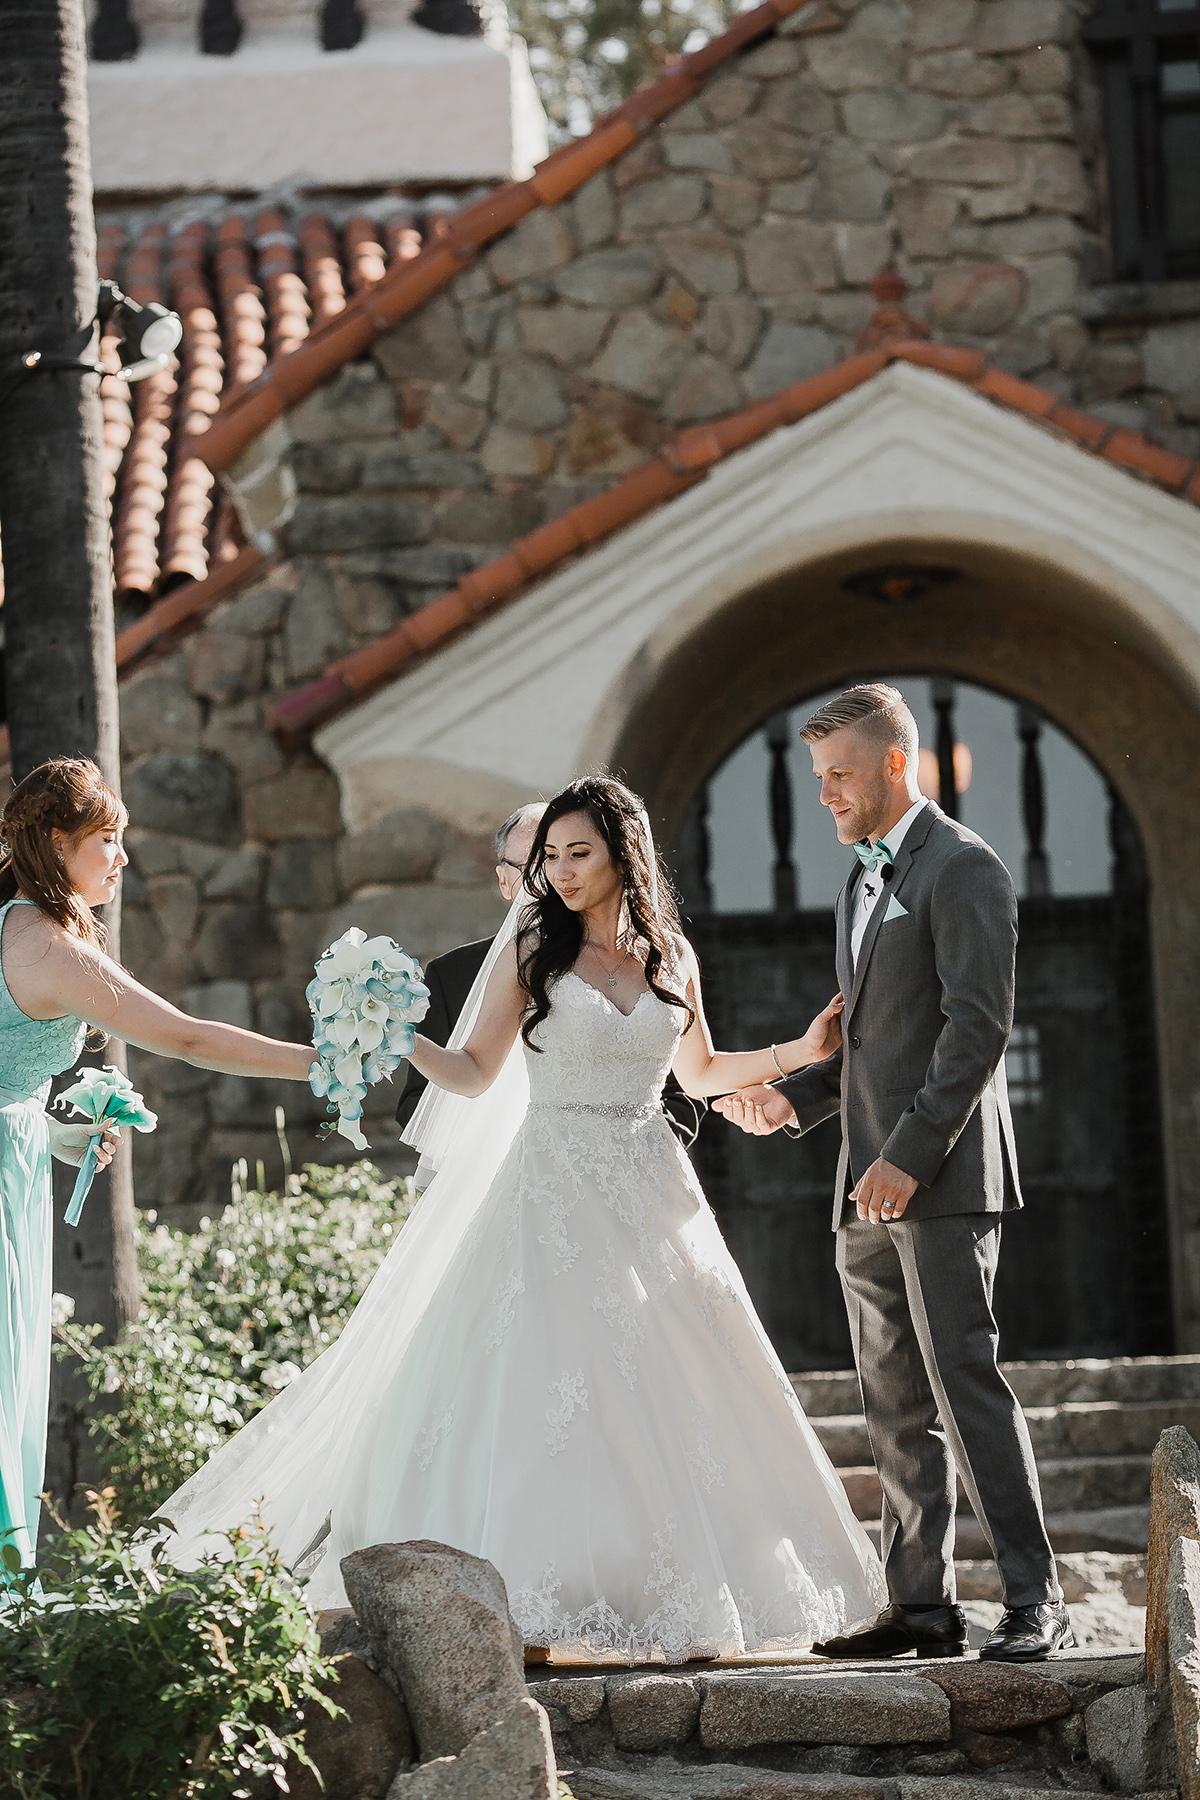 kristine_robert_wedding067.jpg